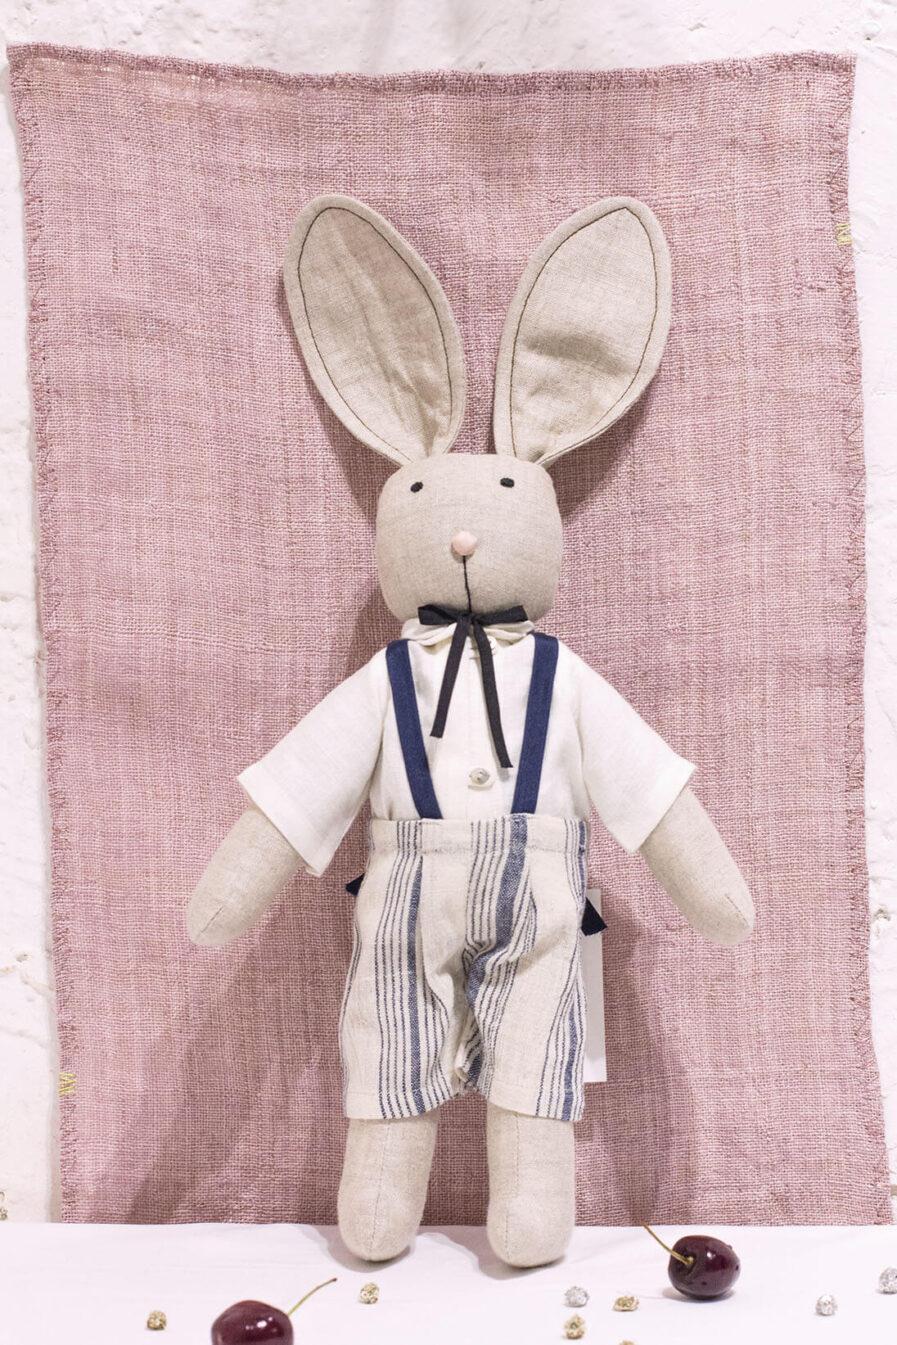 Anavila Saso Bunny Male